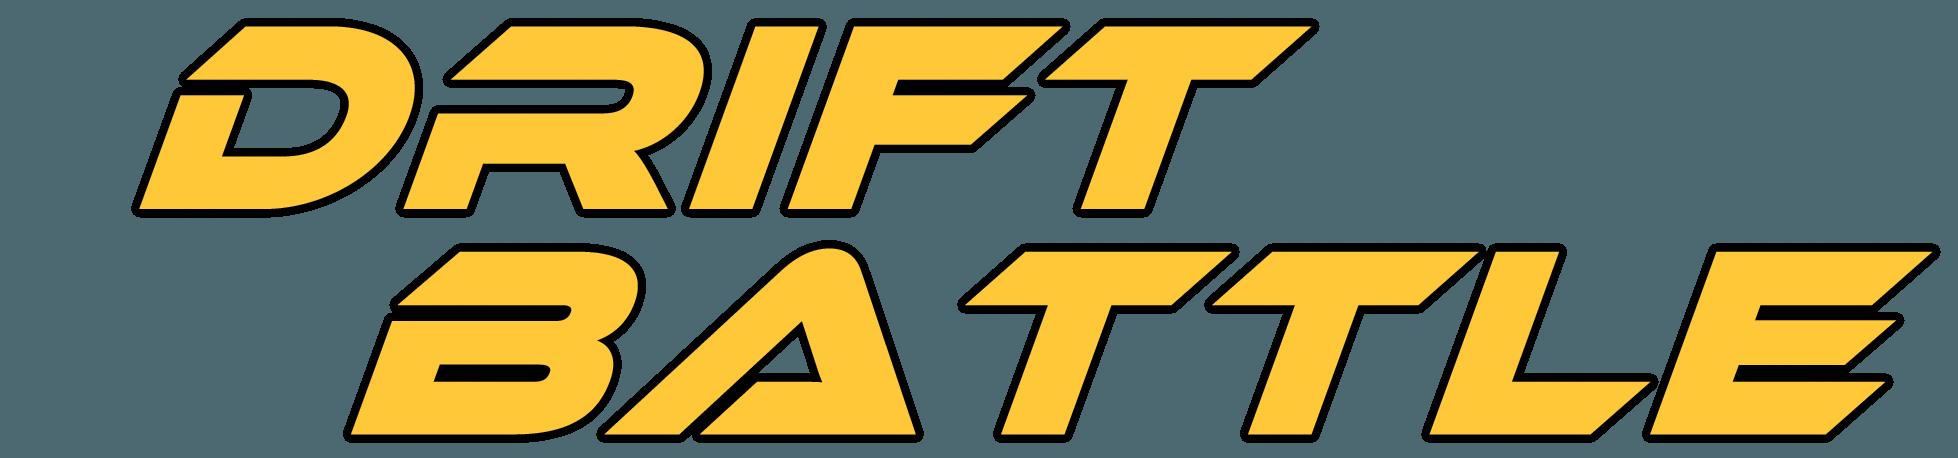 Drift Battle by Racedays.dk